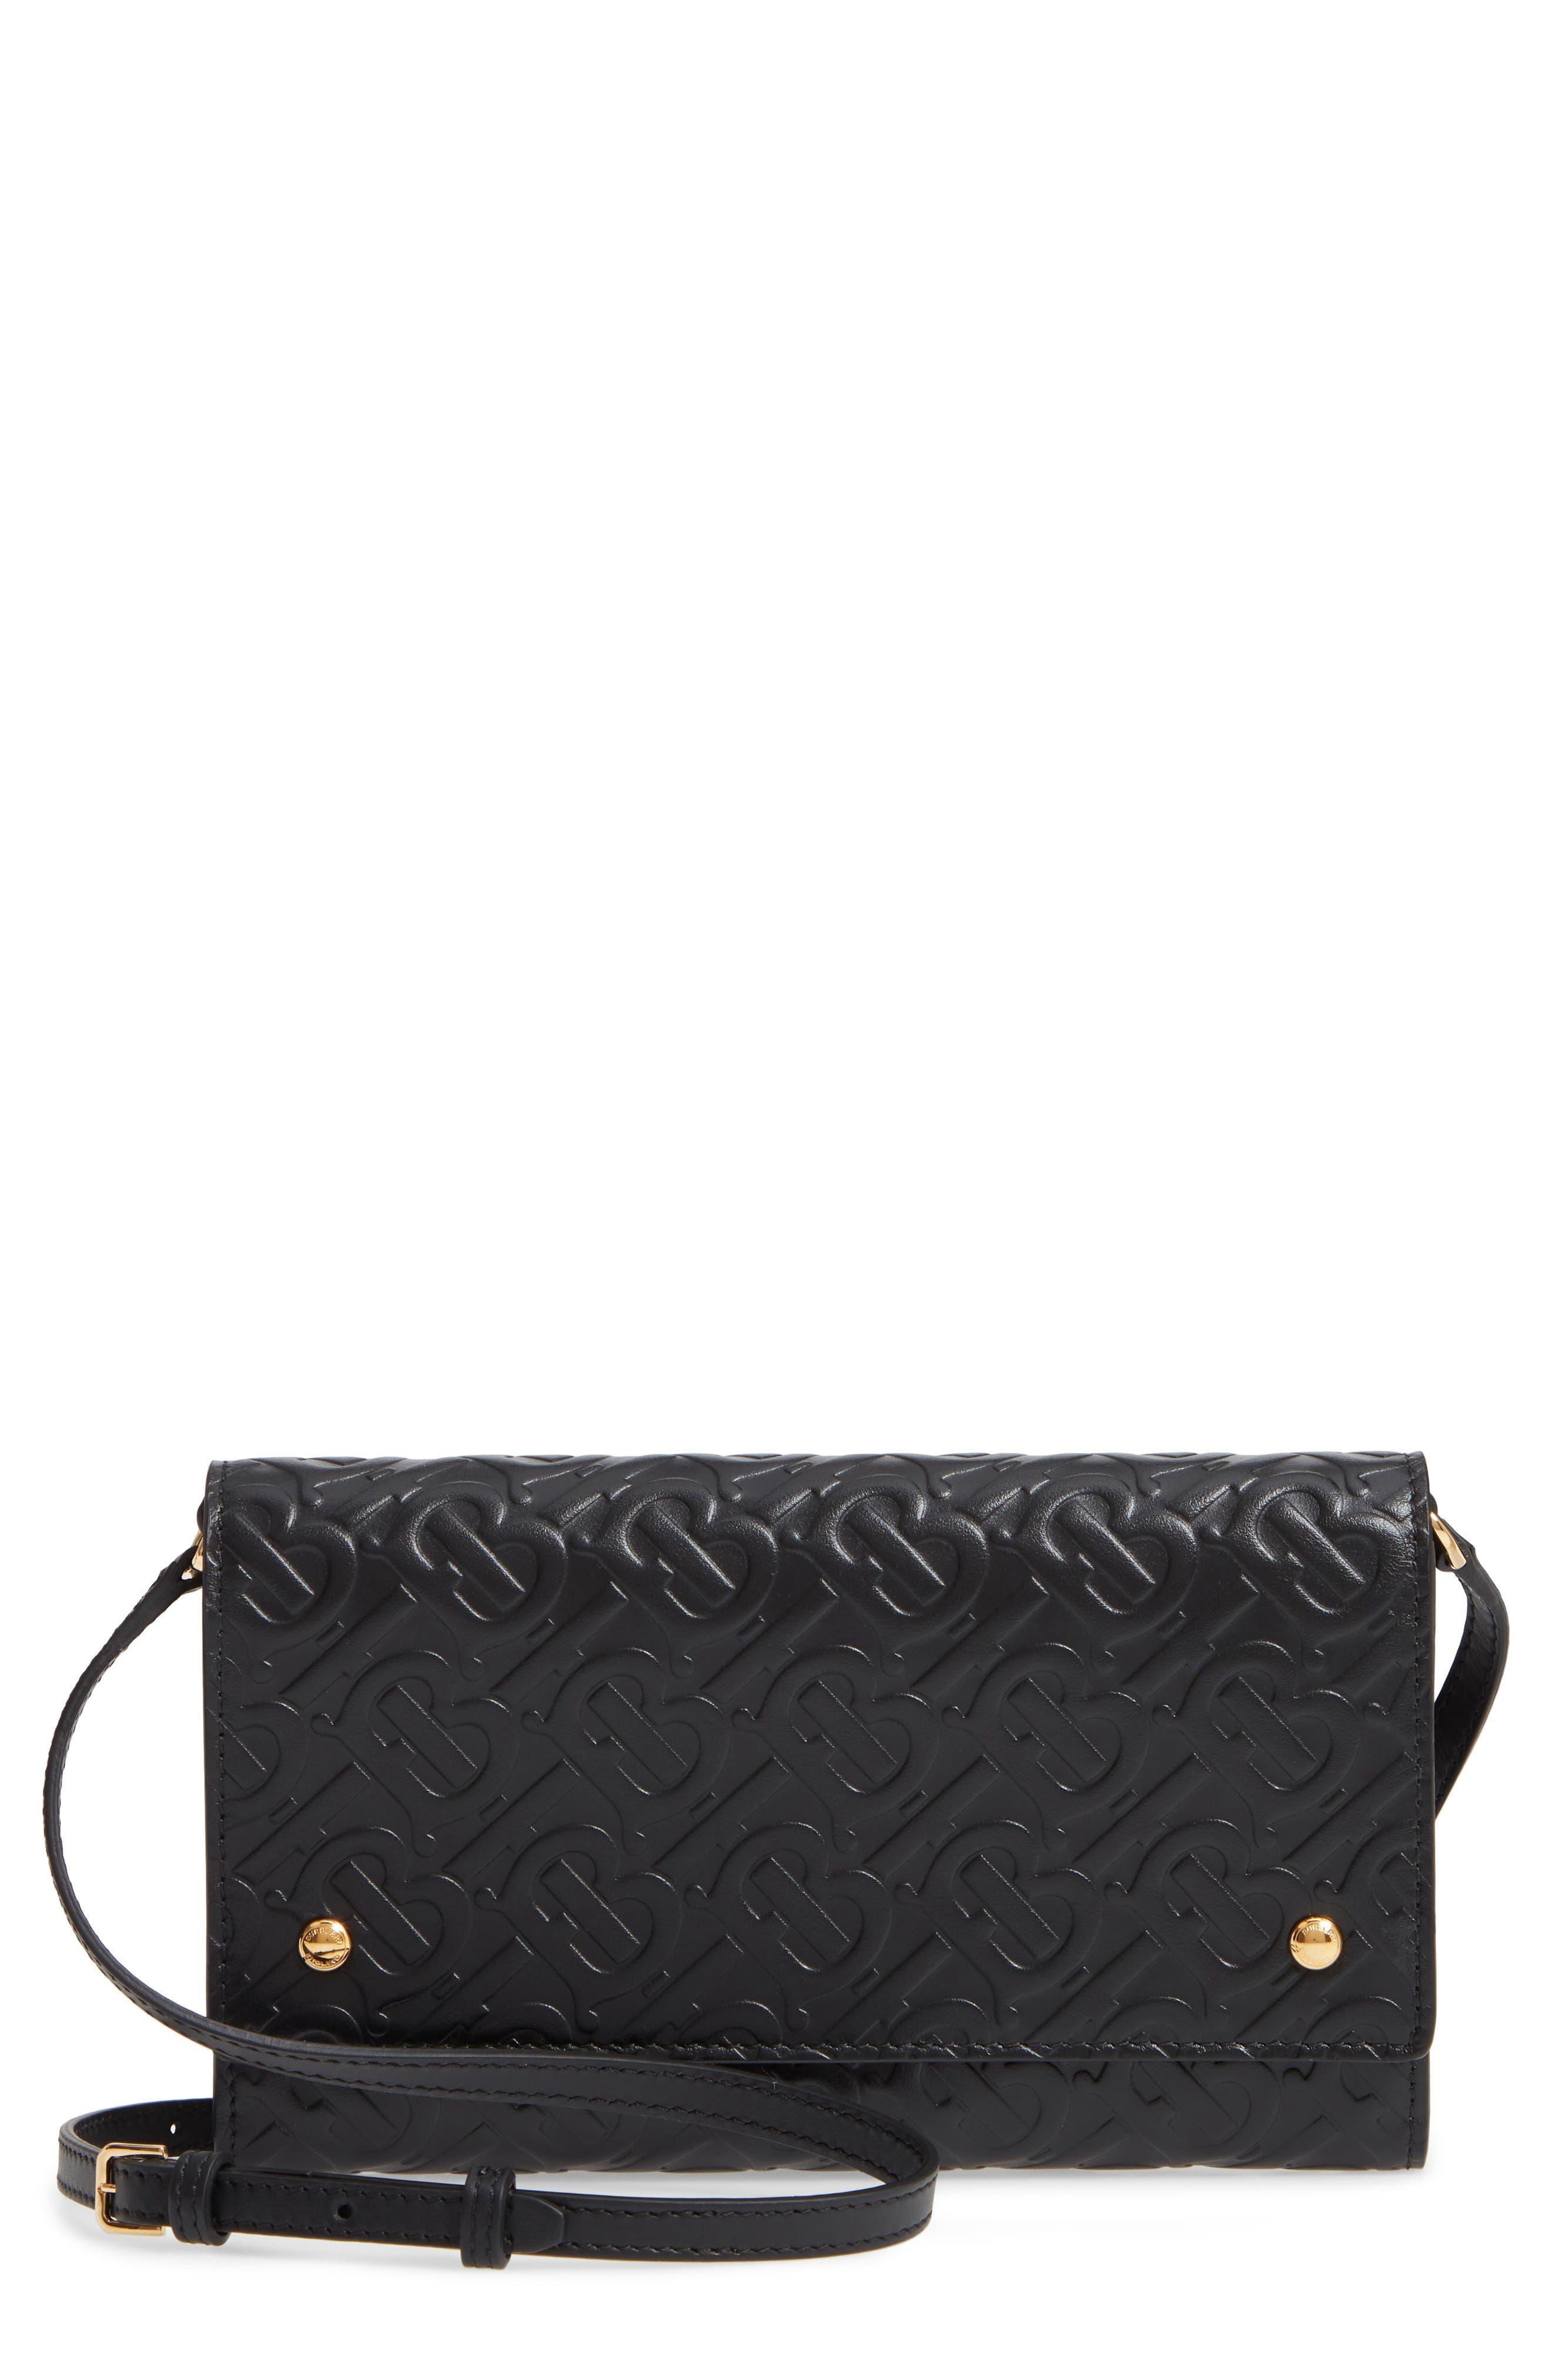 BURBERRY Monogram Embossed Leather Crossbody Wallet, Main, color, BLACK